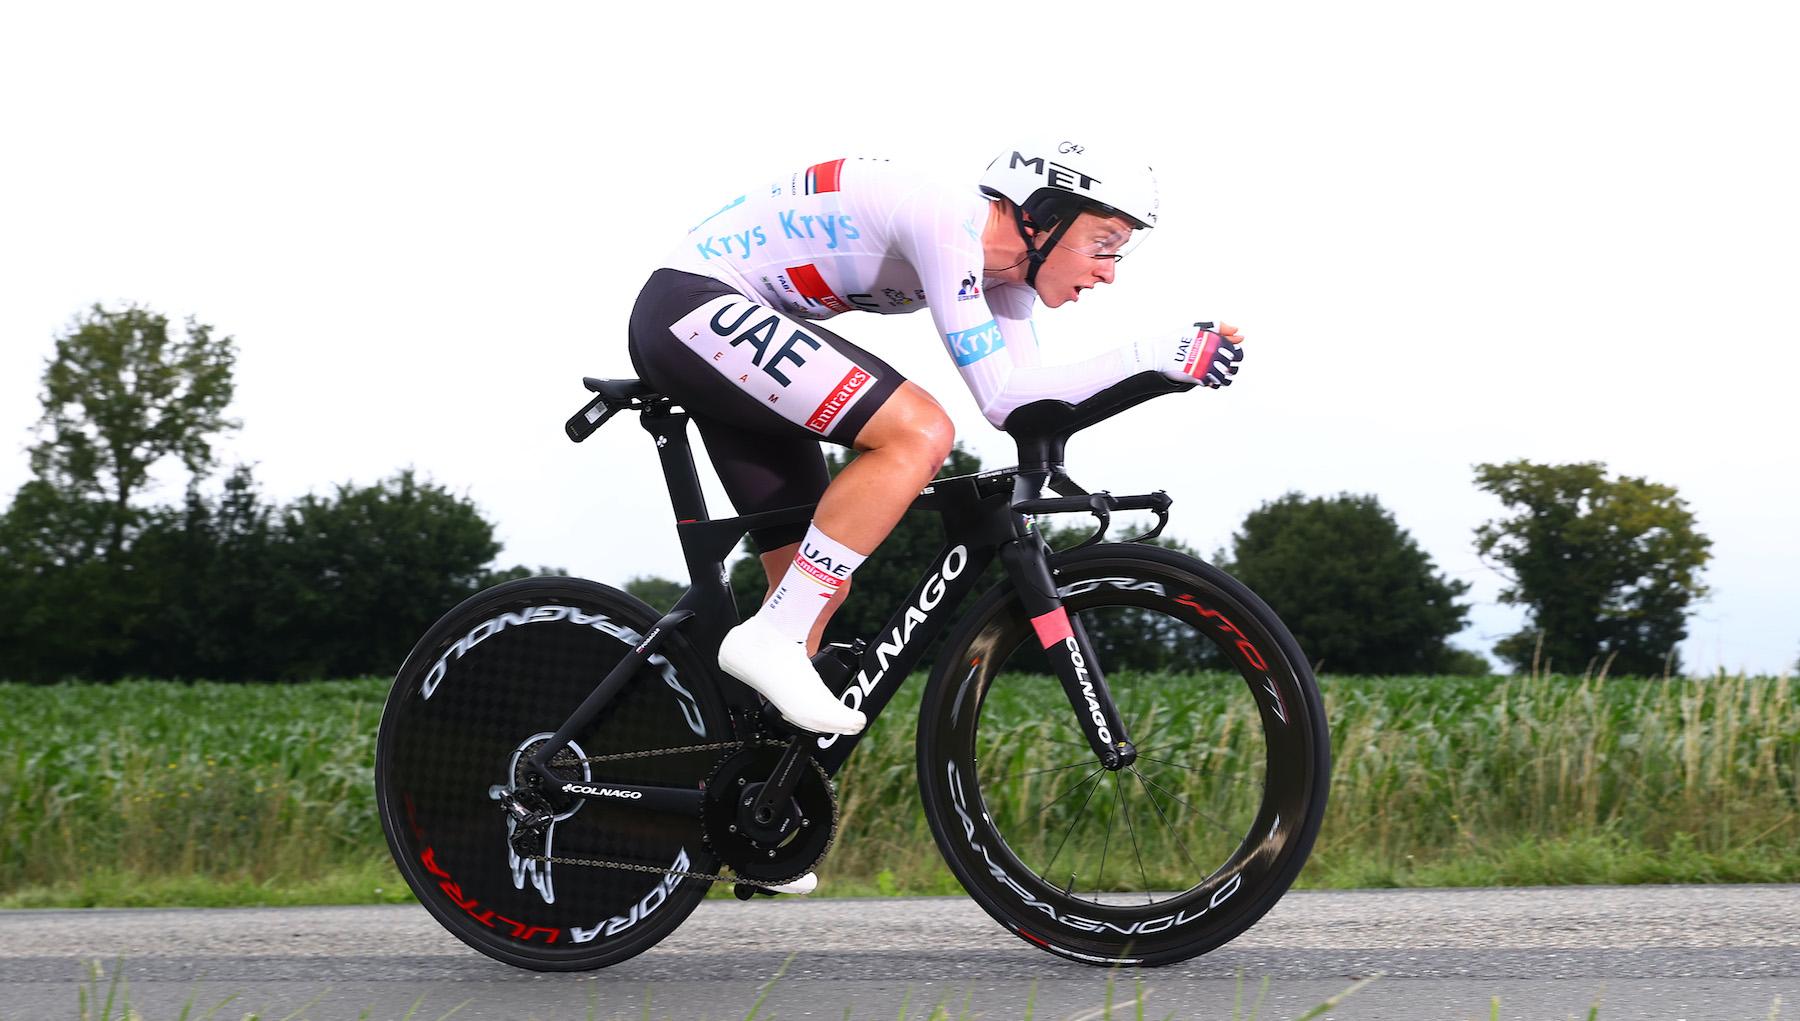 Tadej Pogačar crushes stage five of the Tour de France 2021